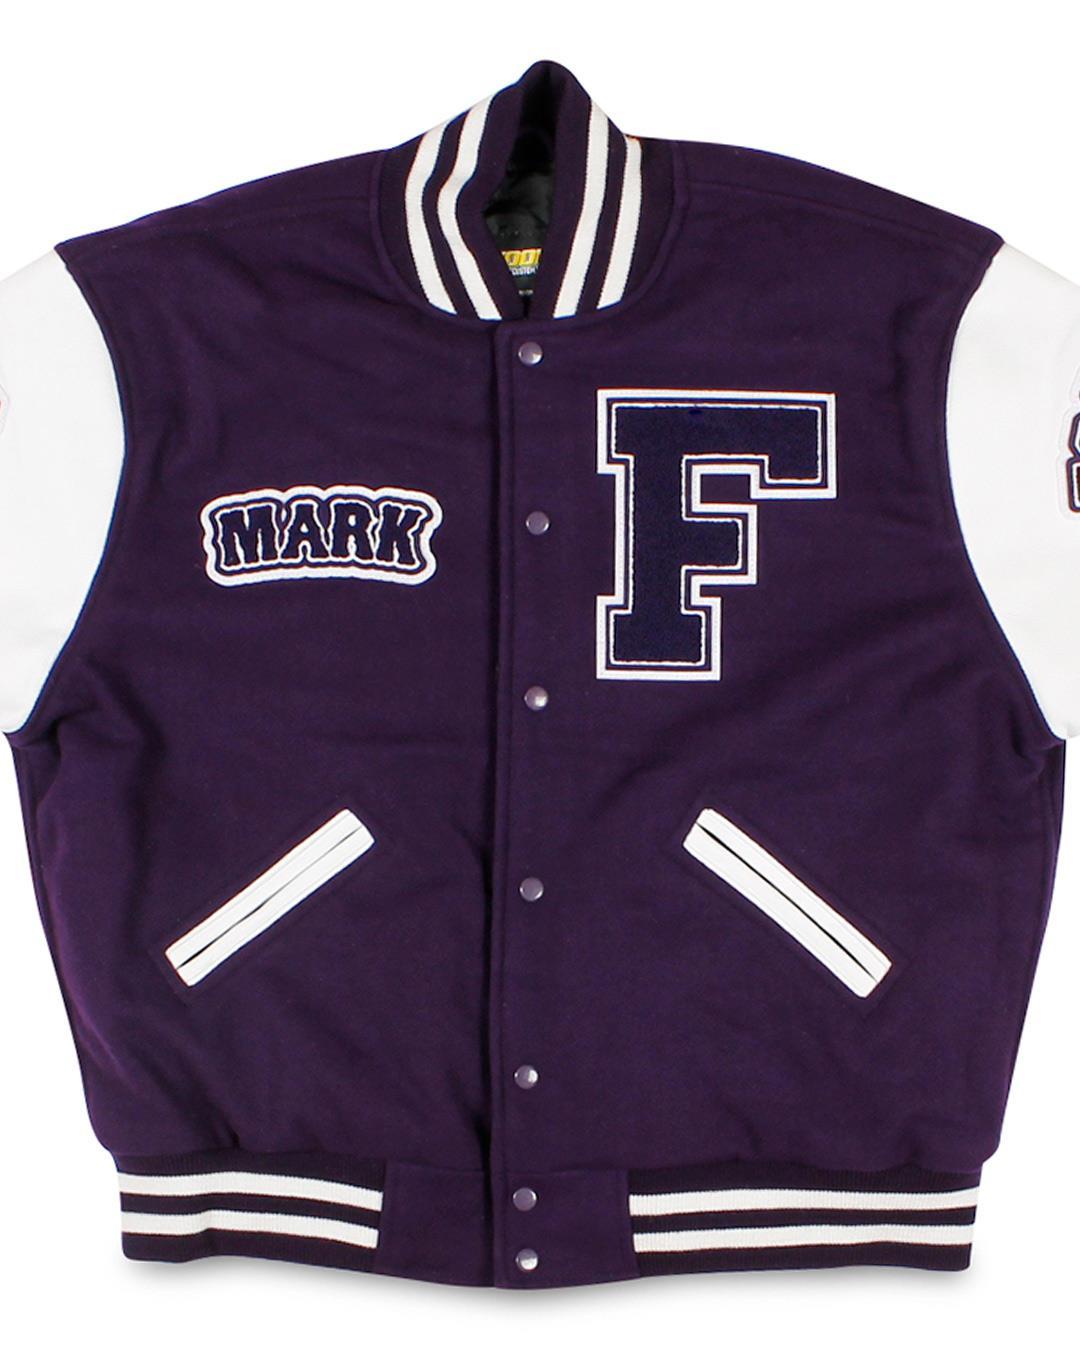 Foster High School Letterman Jacket, Tukwila WA - Front